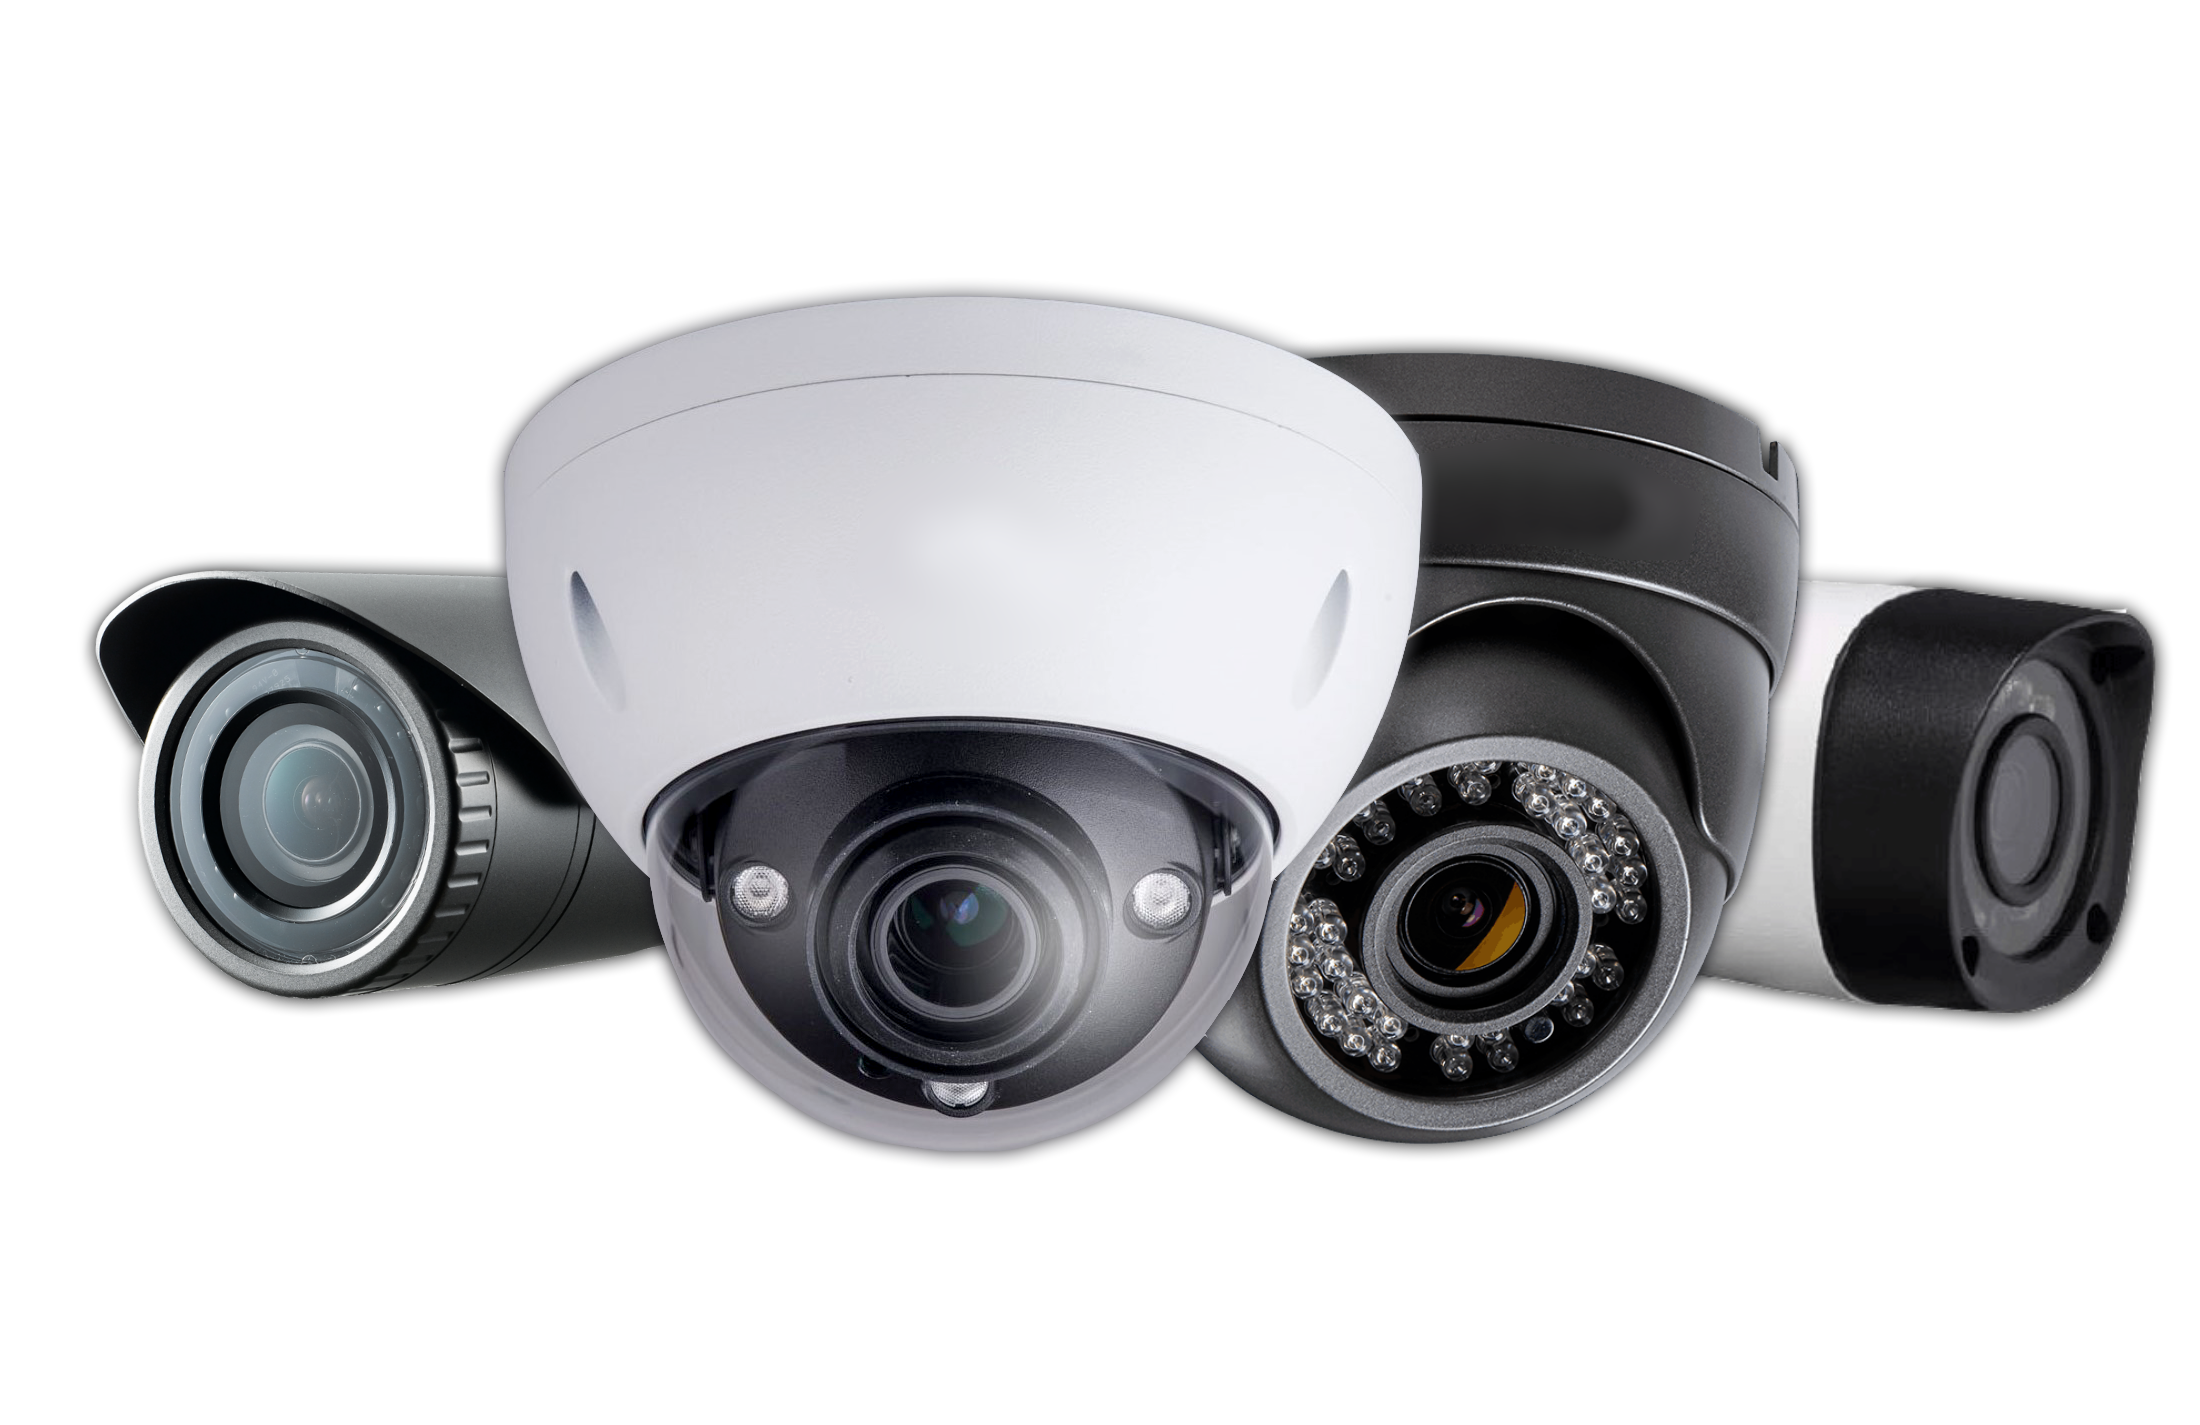 cctv camera options